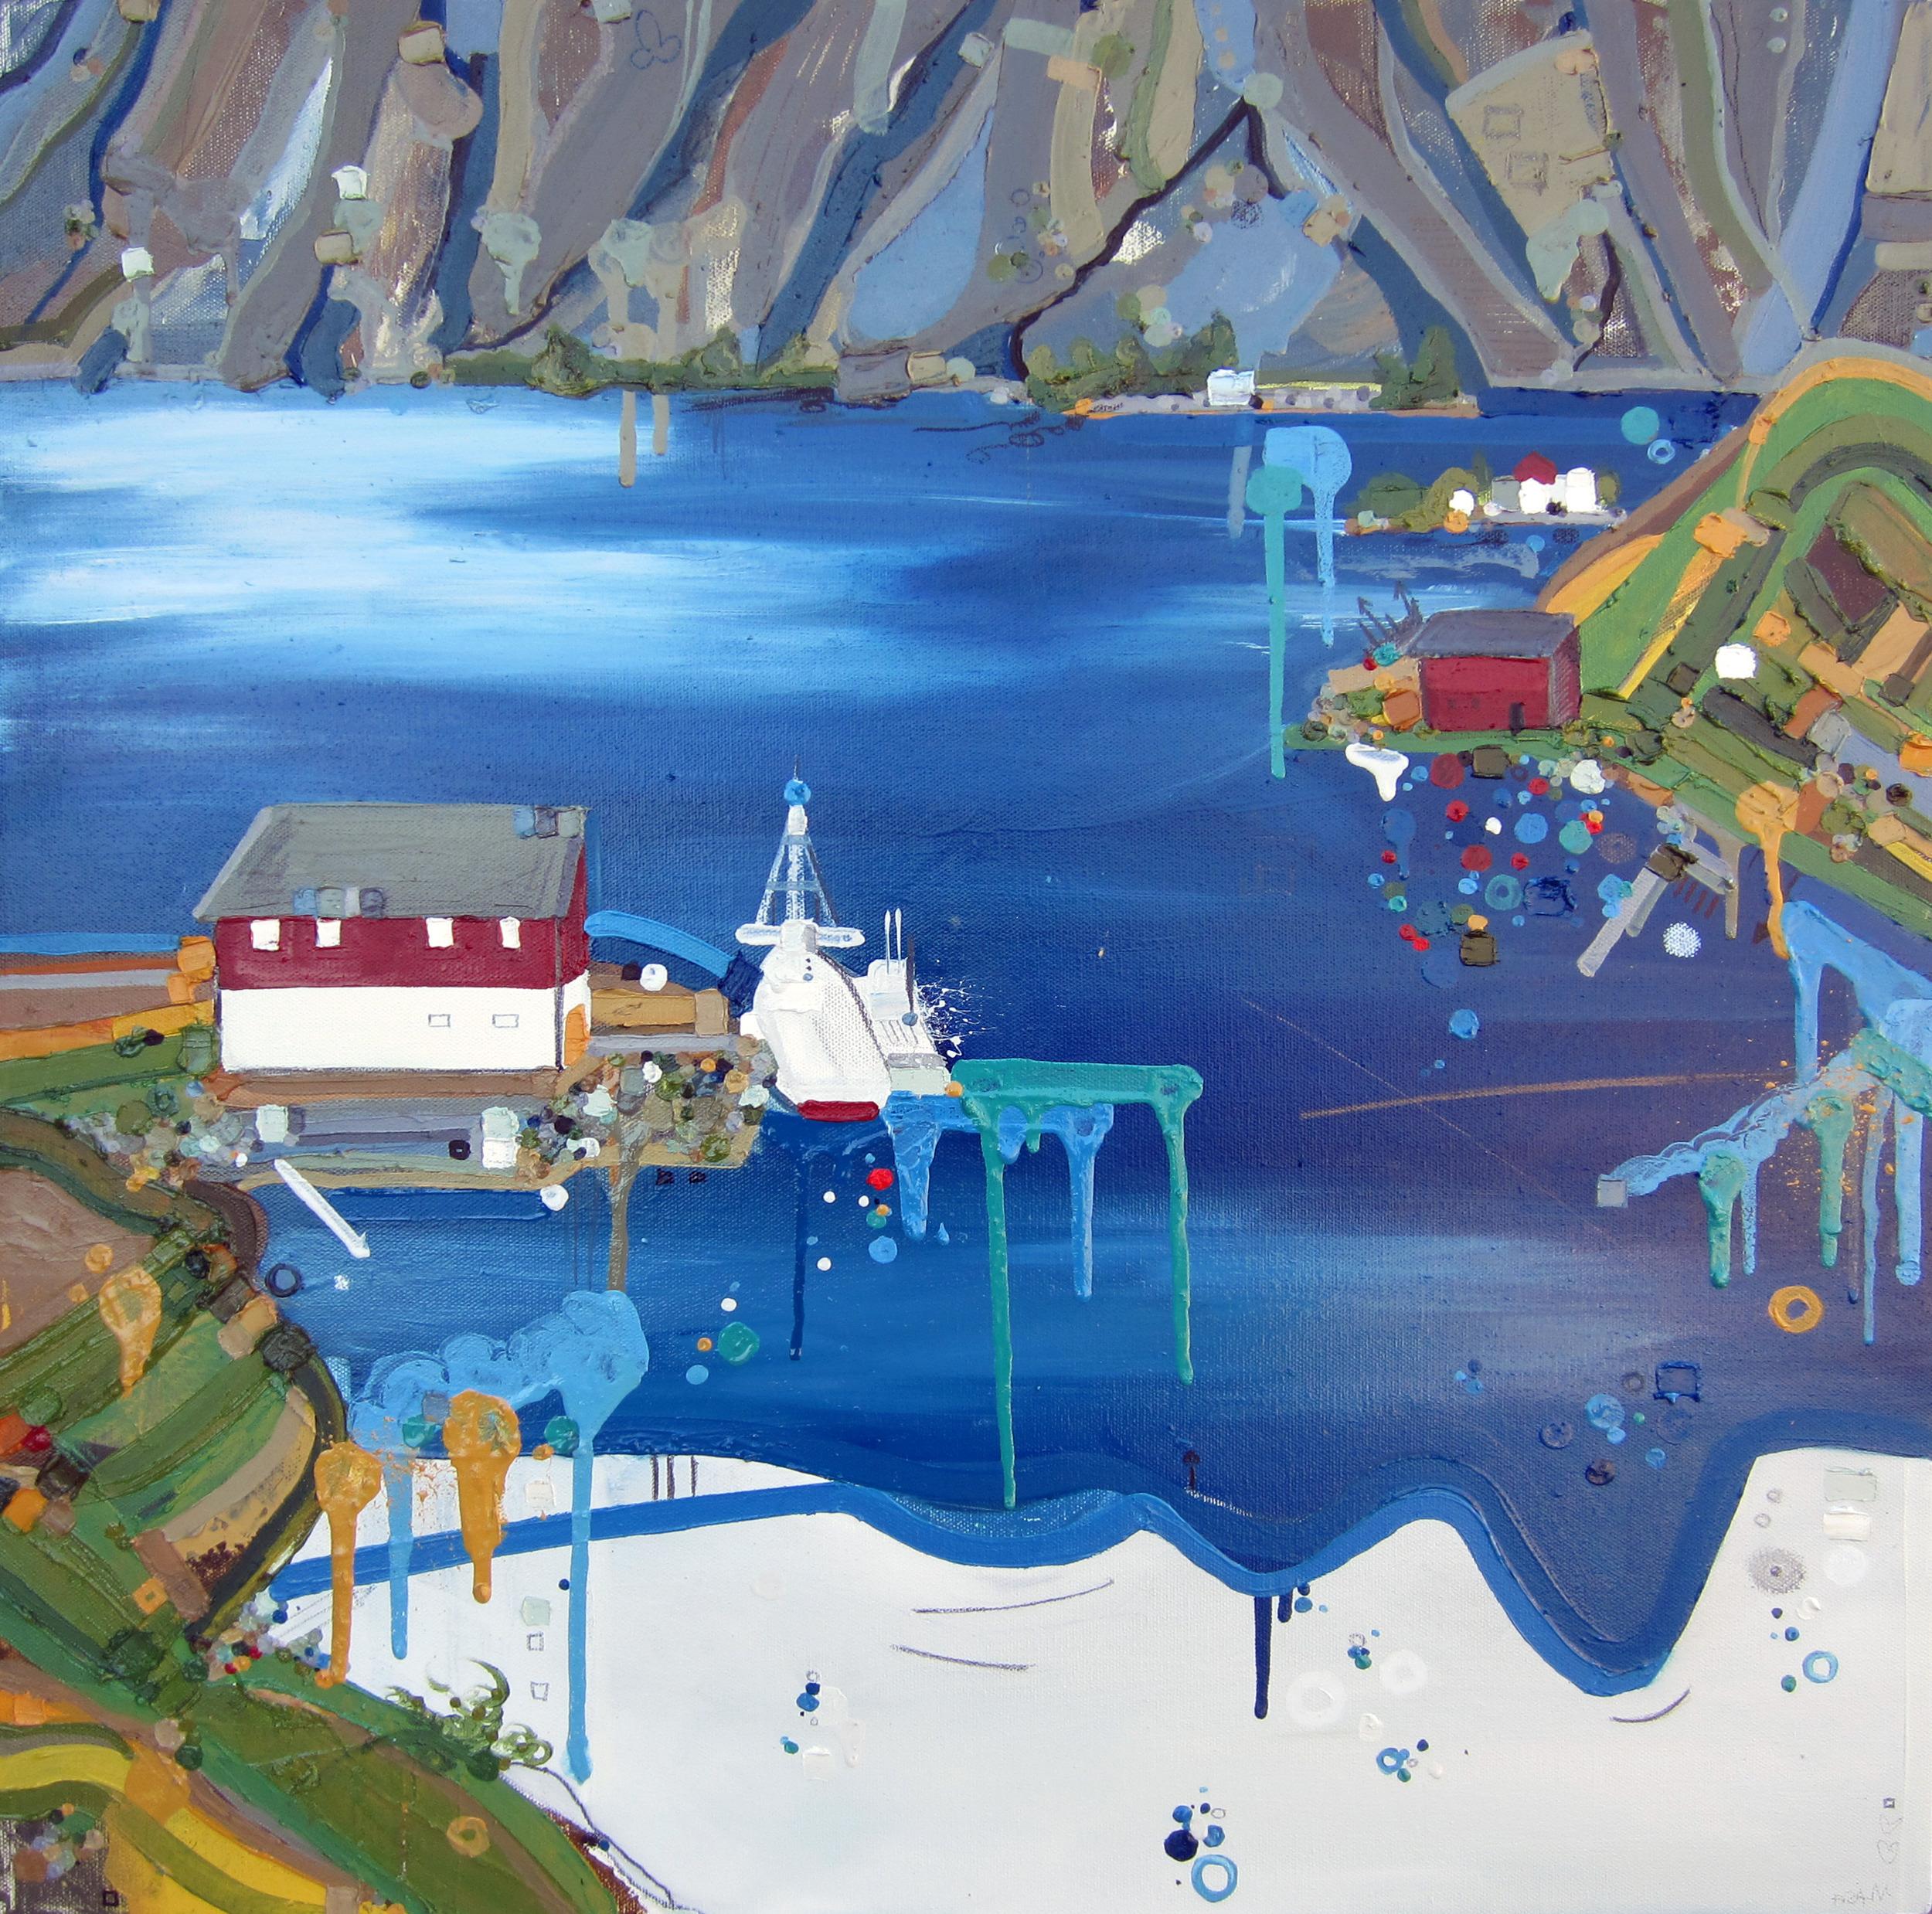 Sund, 2013, Oil on canvas, 24 x 24 inches